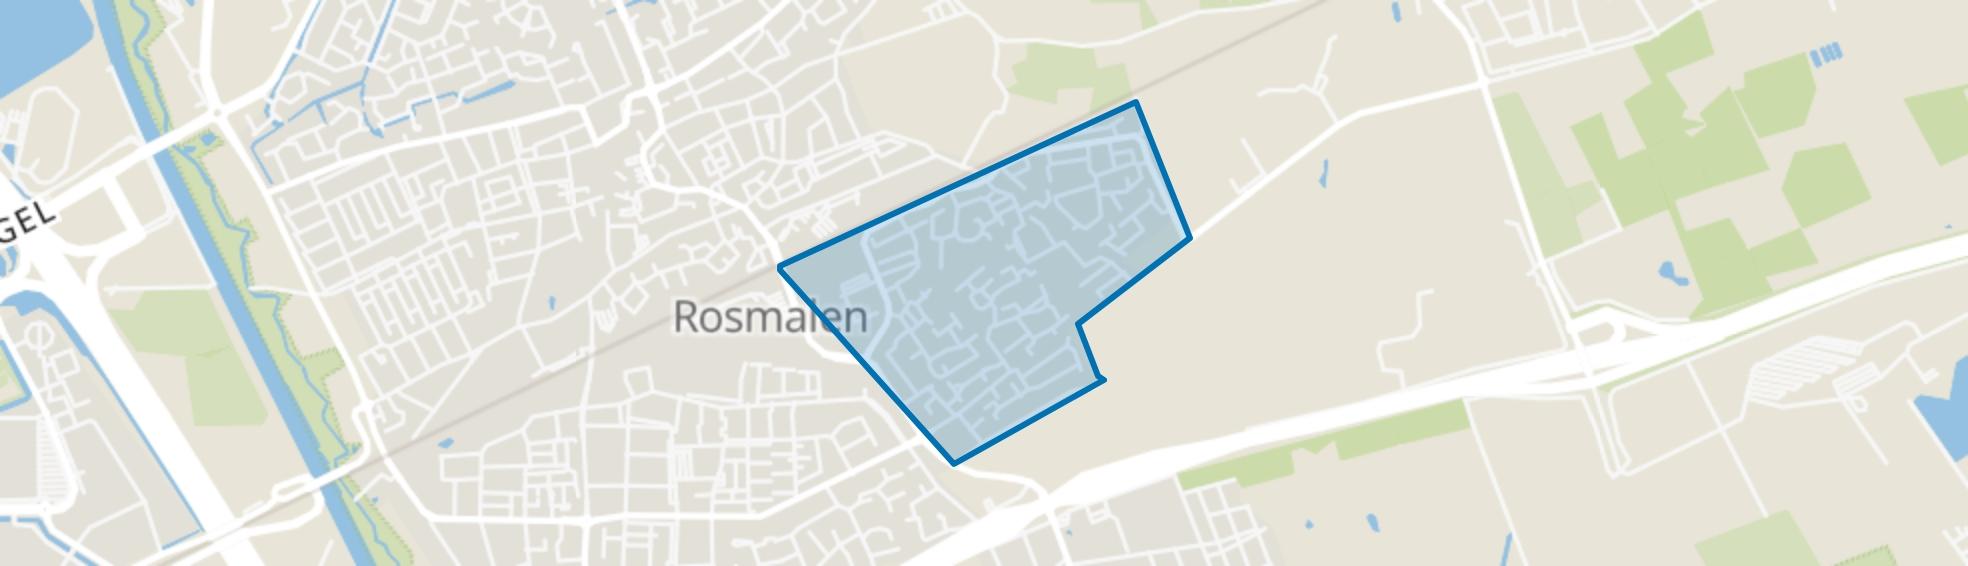 Sparrenburg, Rosmalen map